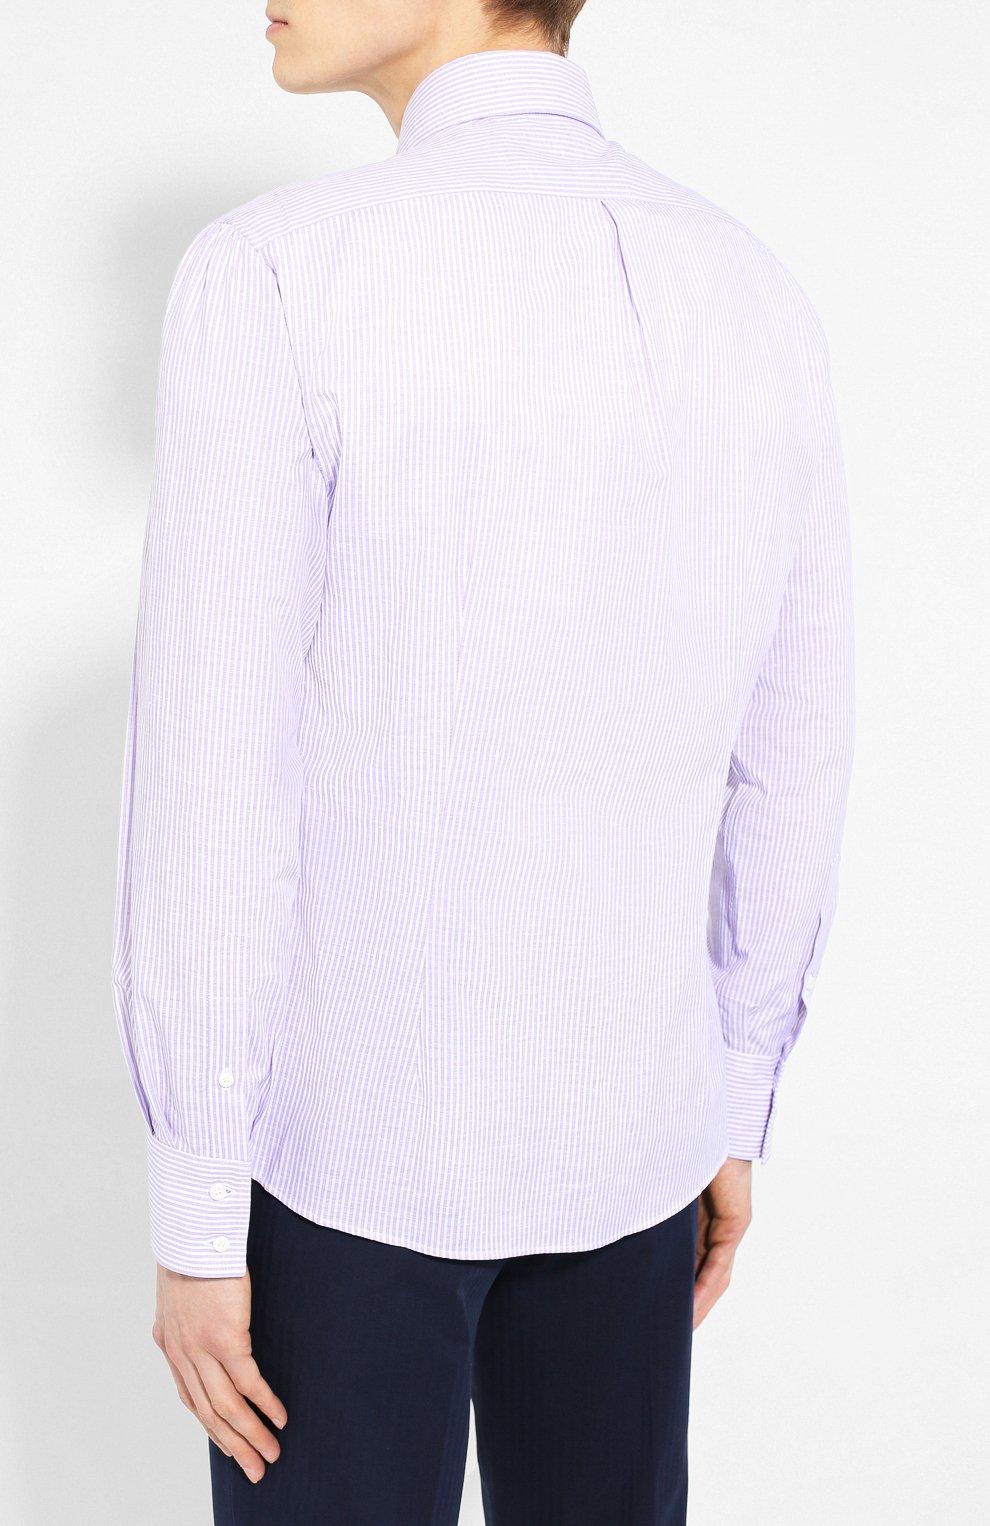 9409f7cfc32e511 Мужская сиреневая рубашка из смеси льна и хлопка BRUNELLO CUCINELLI ...